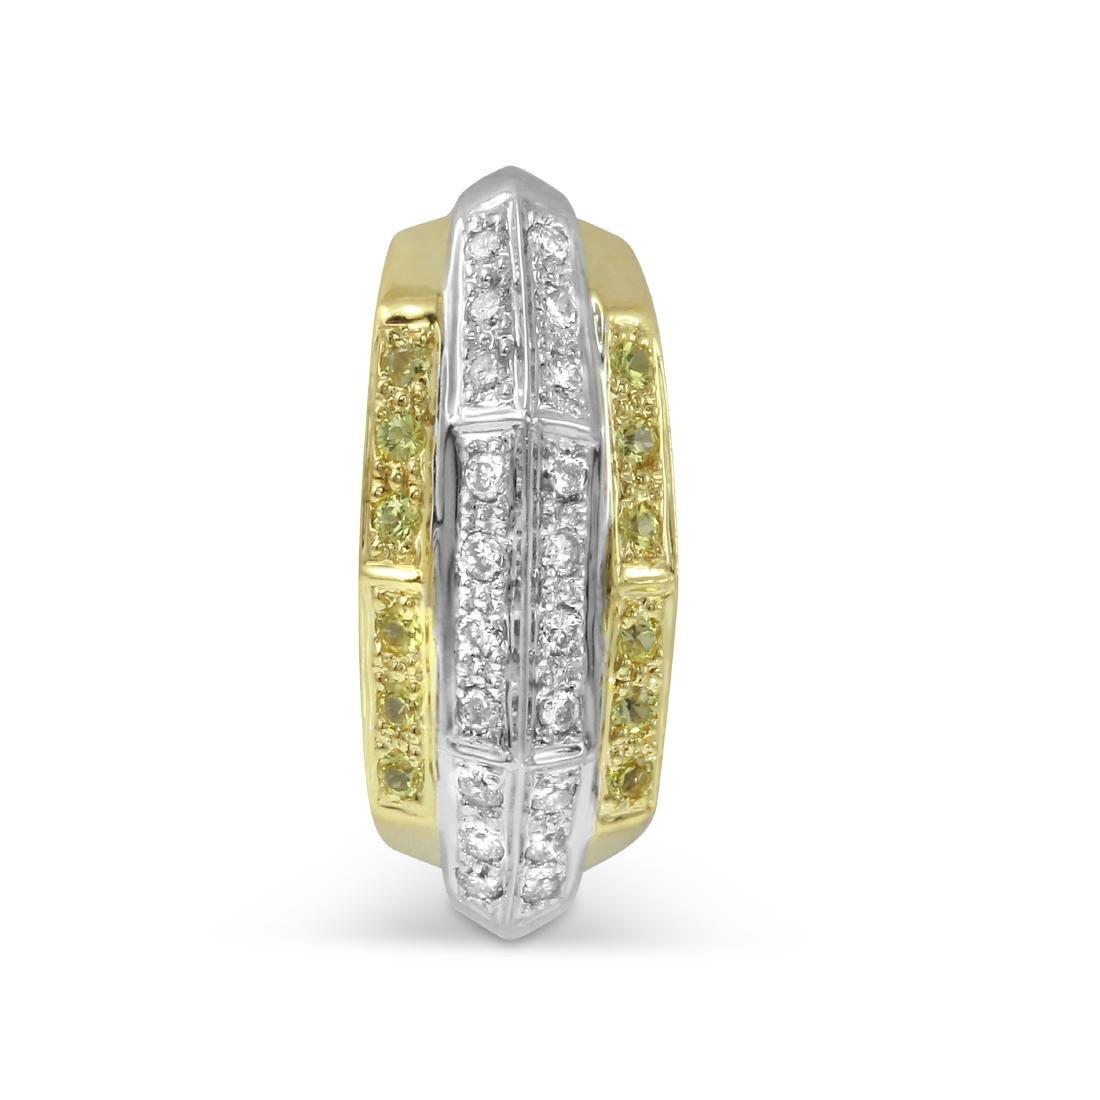 Genuine 0.46 TCW 14K Two Tone Gold Ladies Pendant